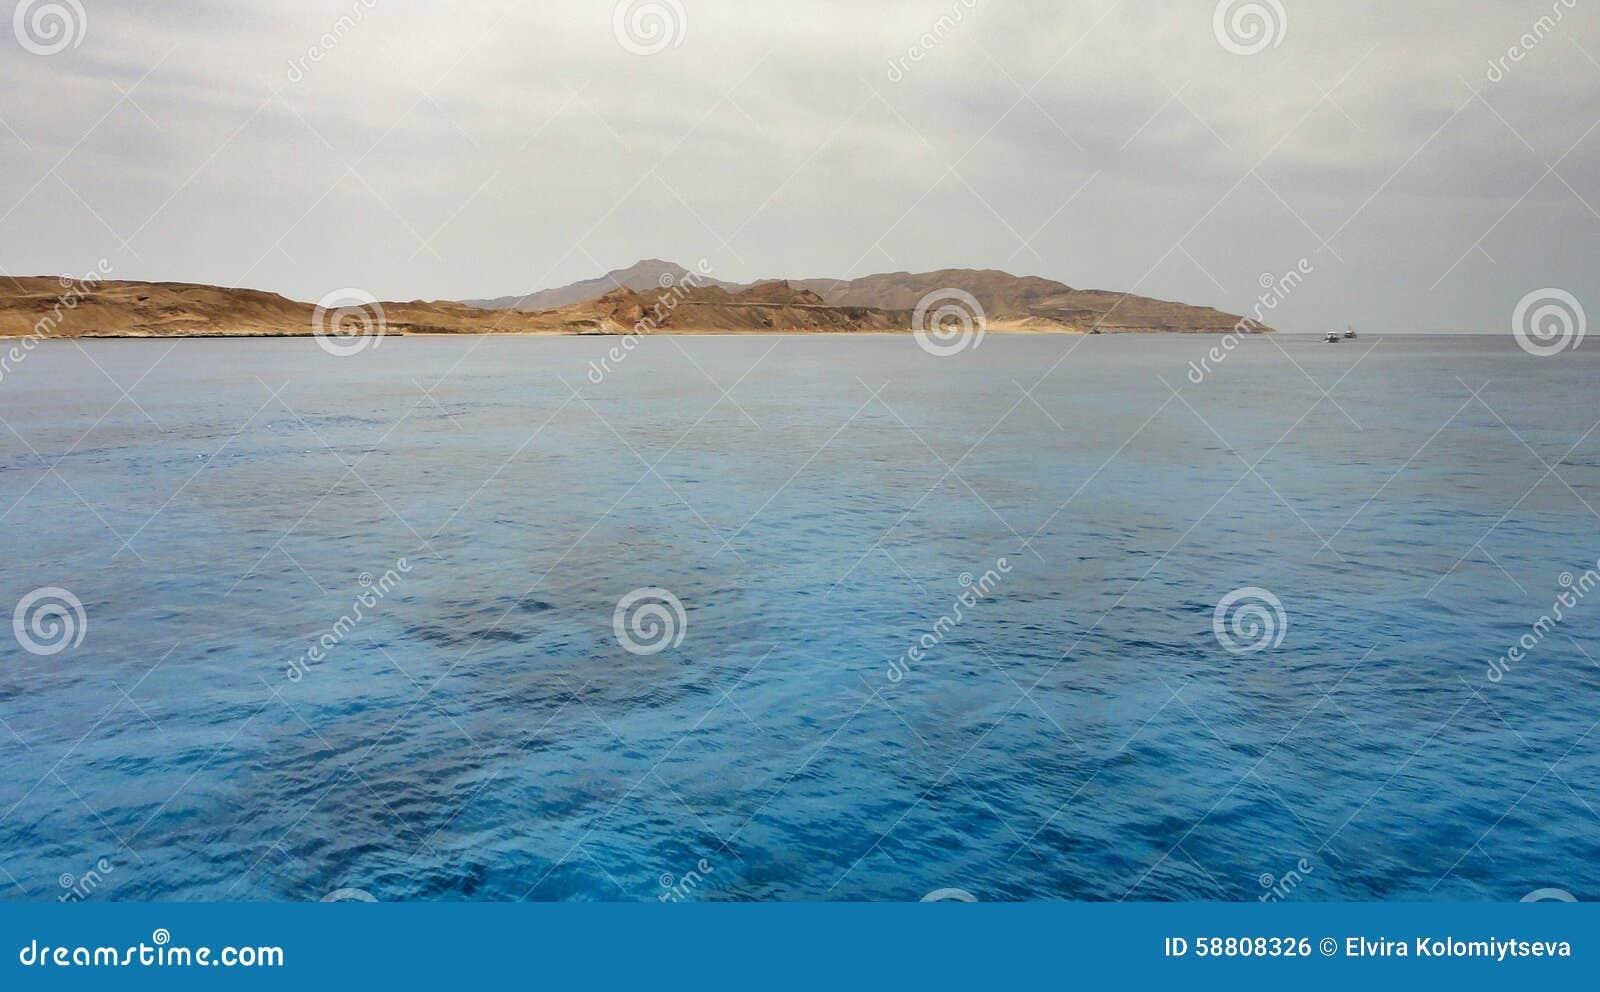 Seascape And Amazing Blue Water Stock Photo - Image: 58808326 - photo#47